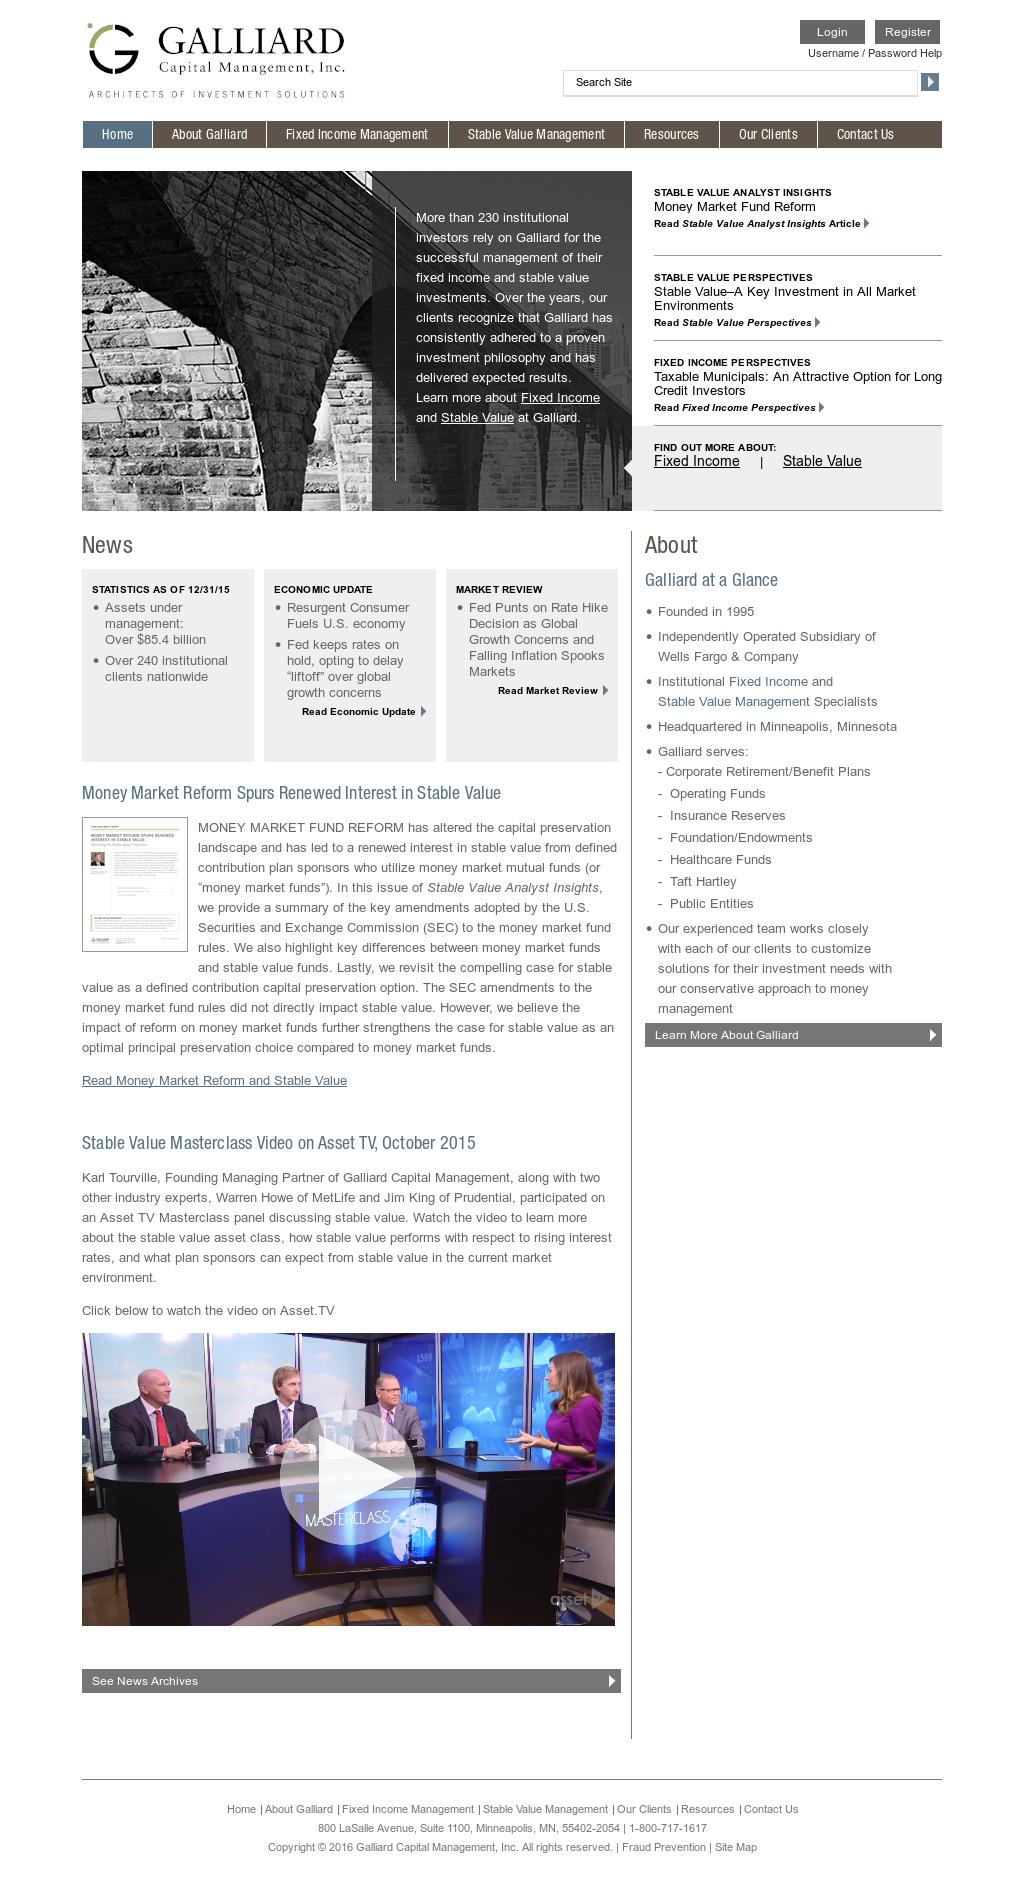 Galliard Capital Management Competitors, Revenue and